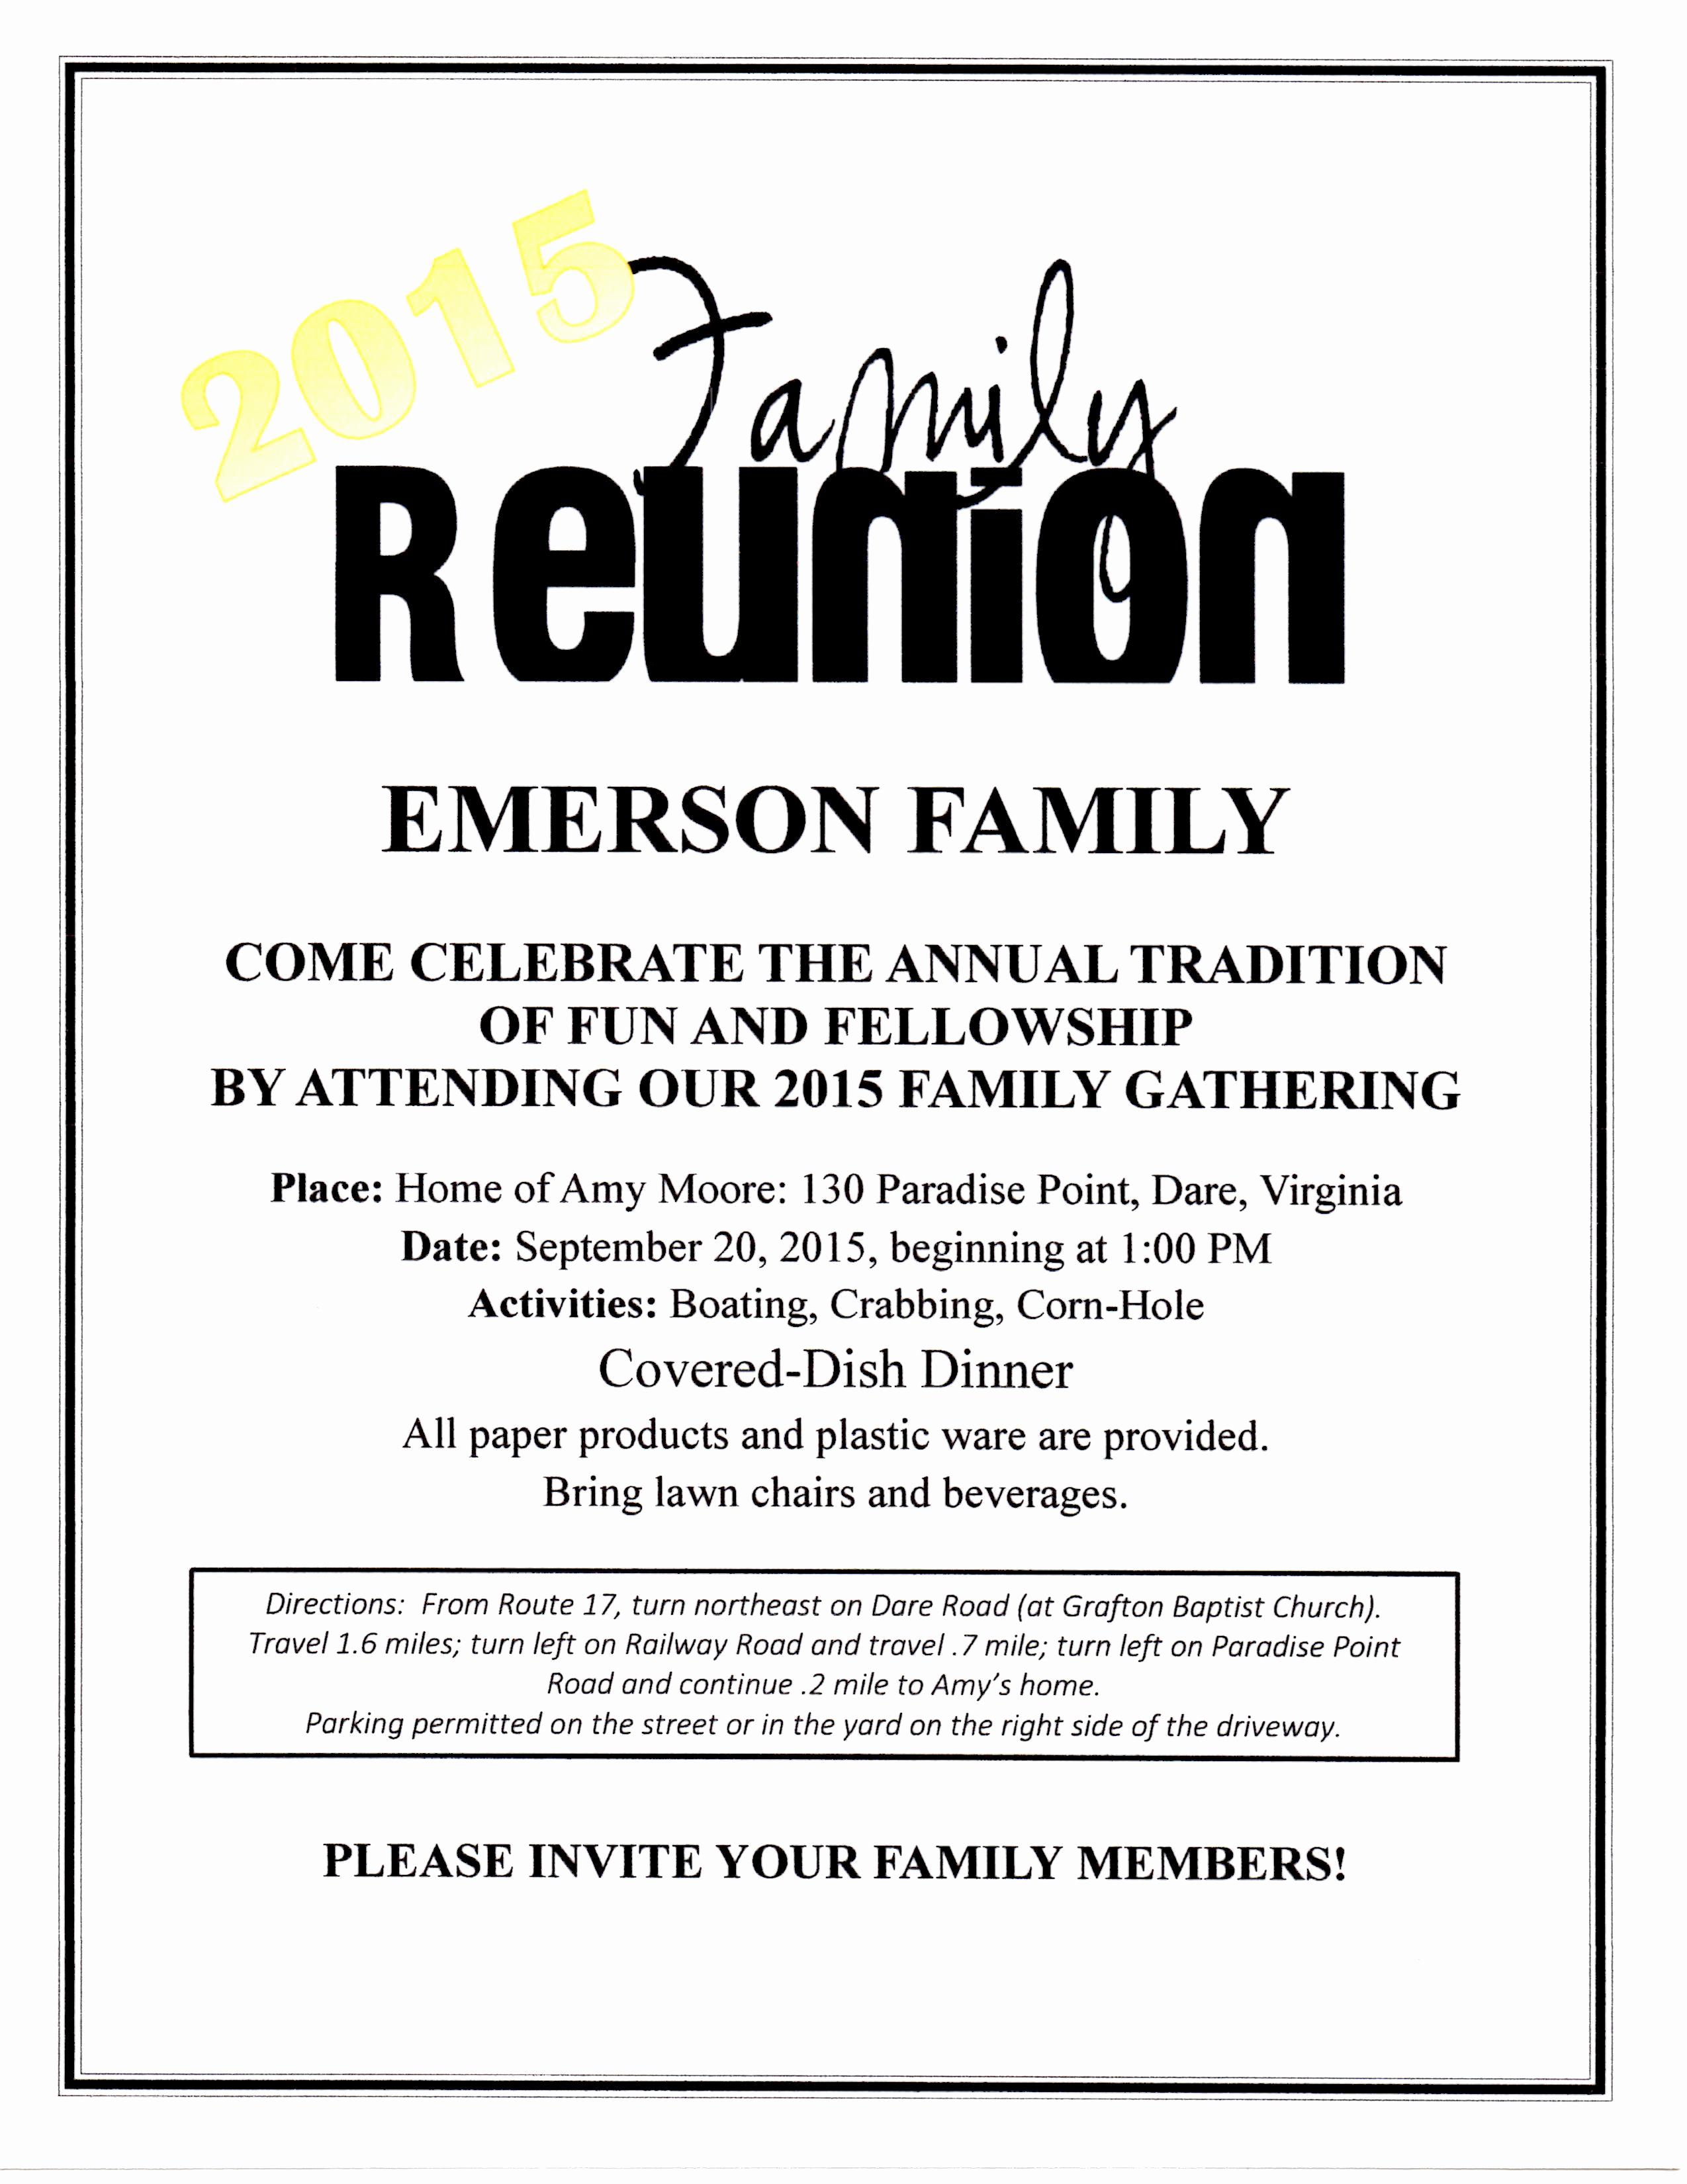 Family Reunion Flyers Templates Fresh 2015 Family Reunion